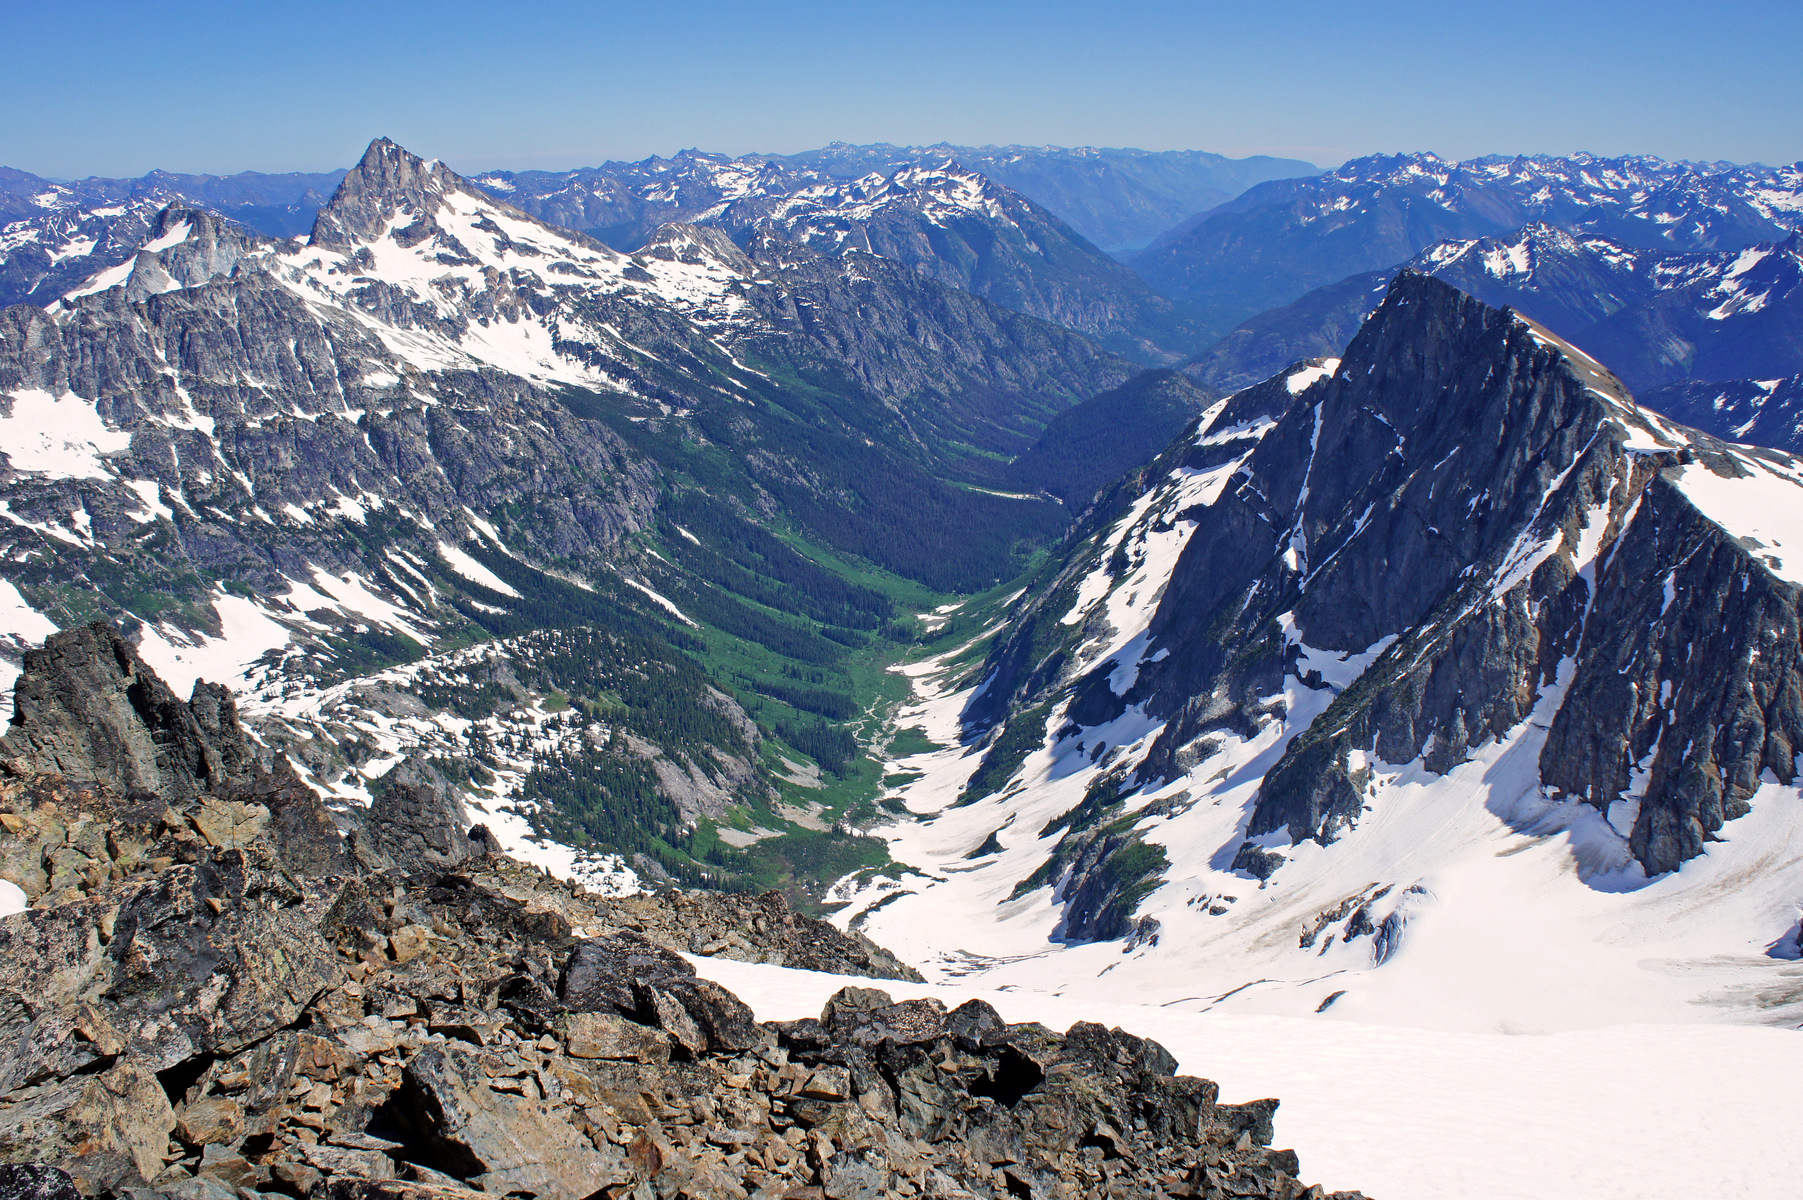 view from Mount Buckner, North Cascades National Park, Washington